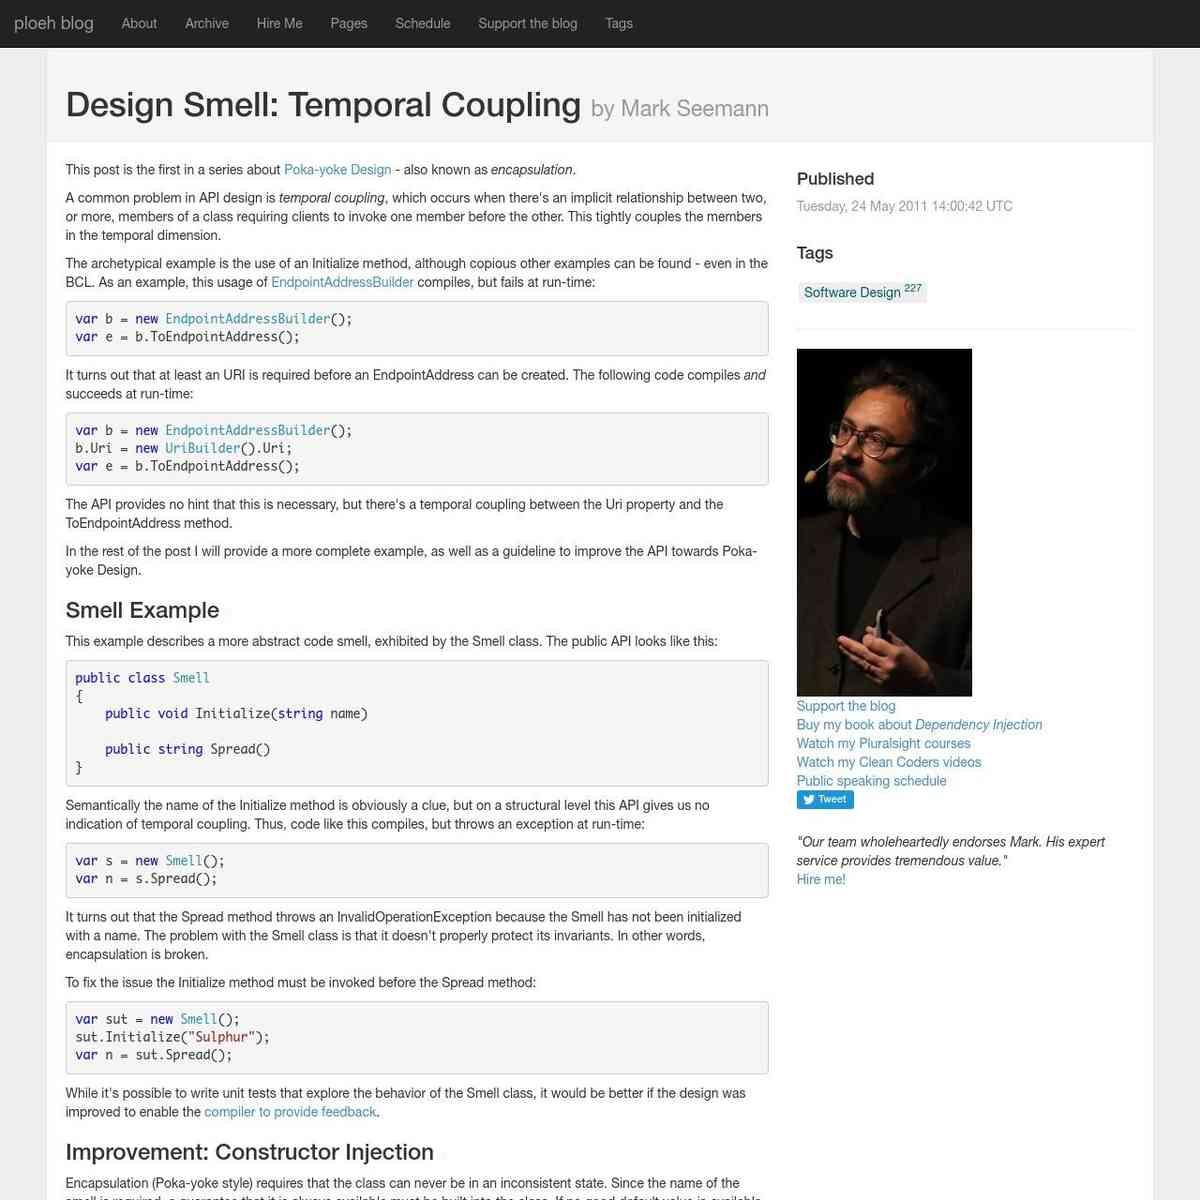 Design Smell: Temporal Coupling